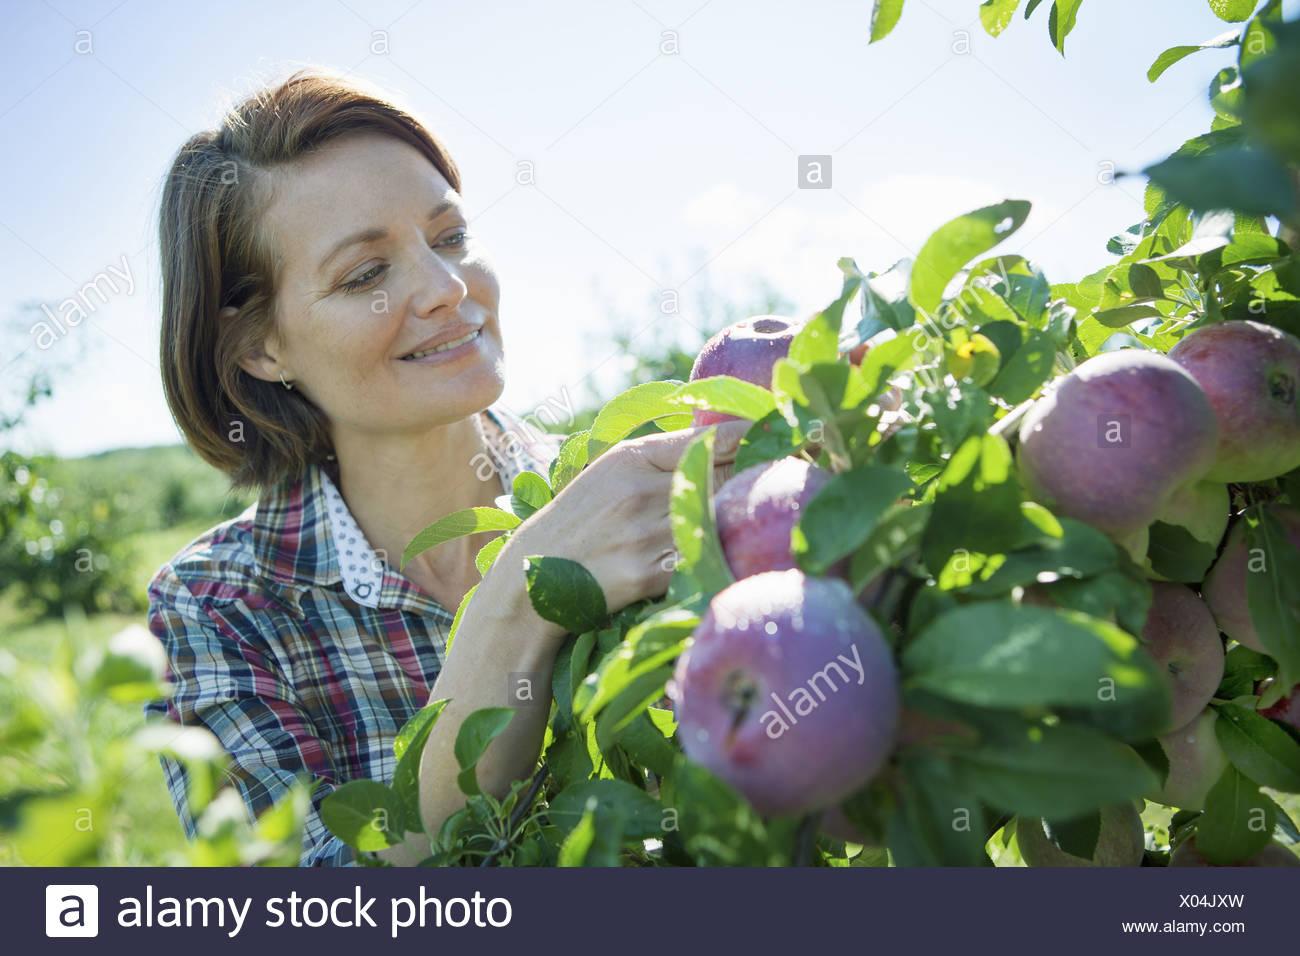 Woodstock New York USA woman in plaid shirt picking apples fruit tree - Stock Image